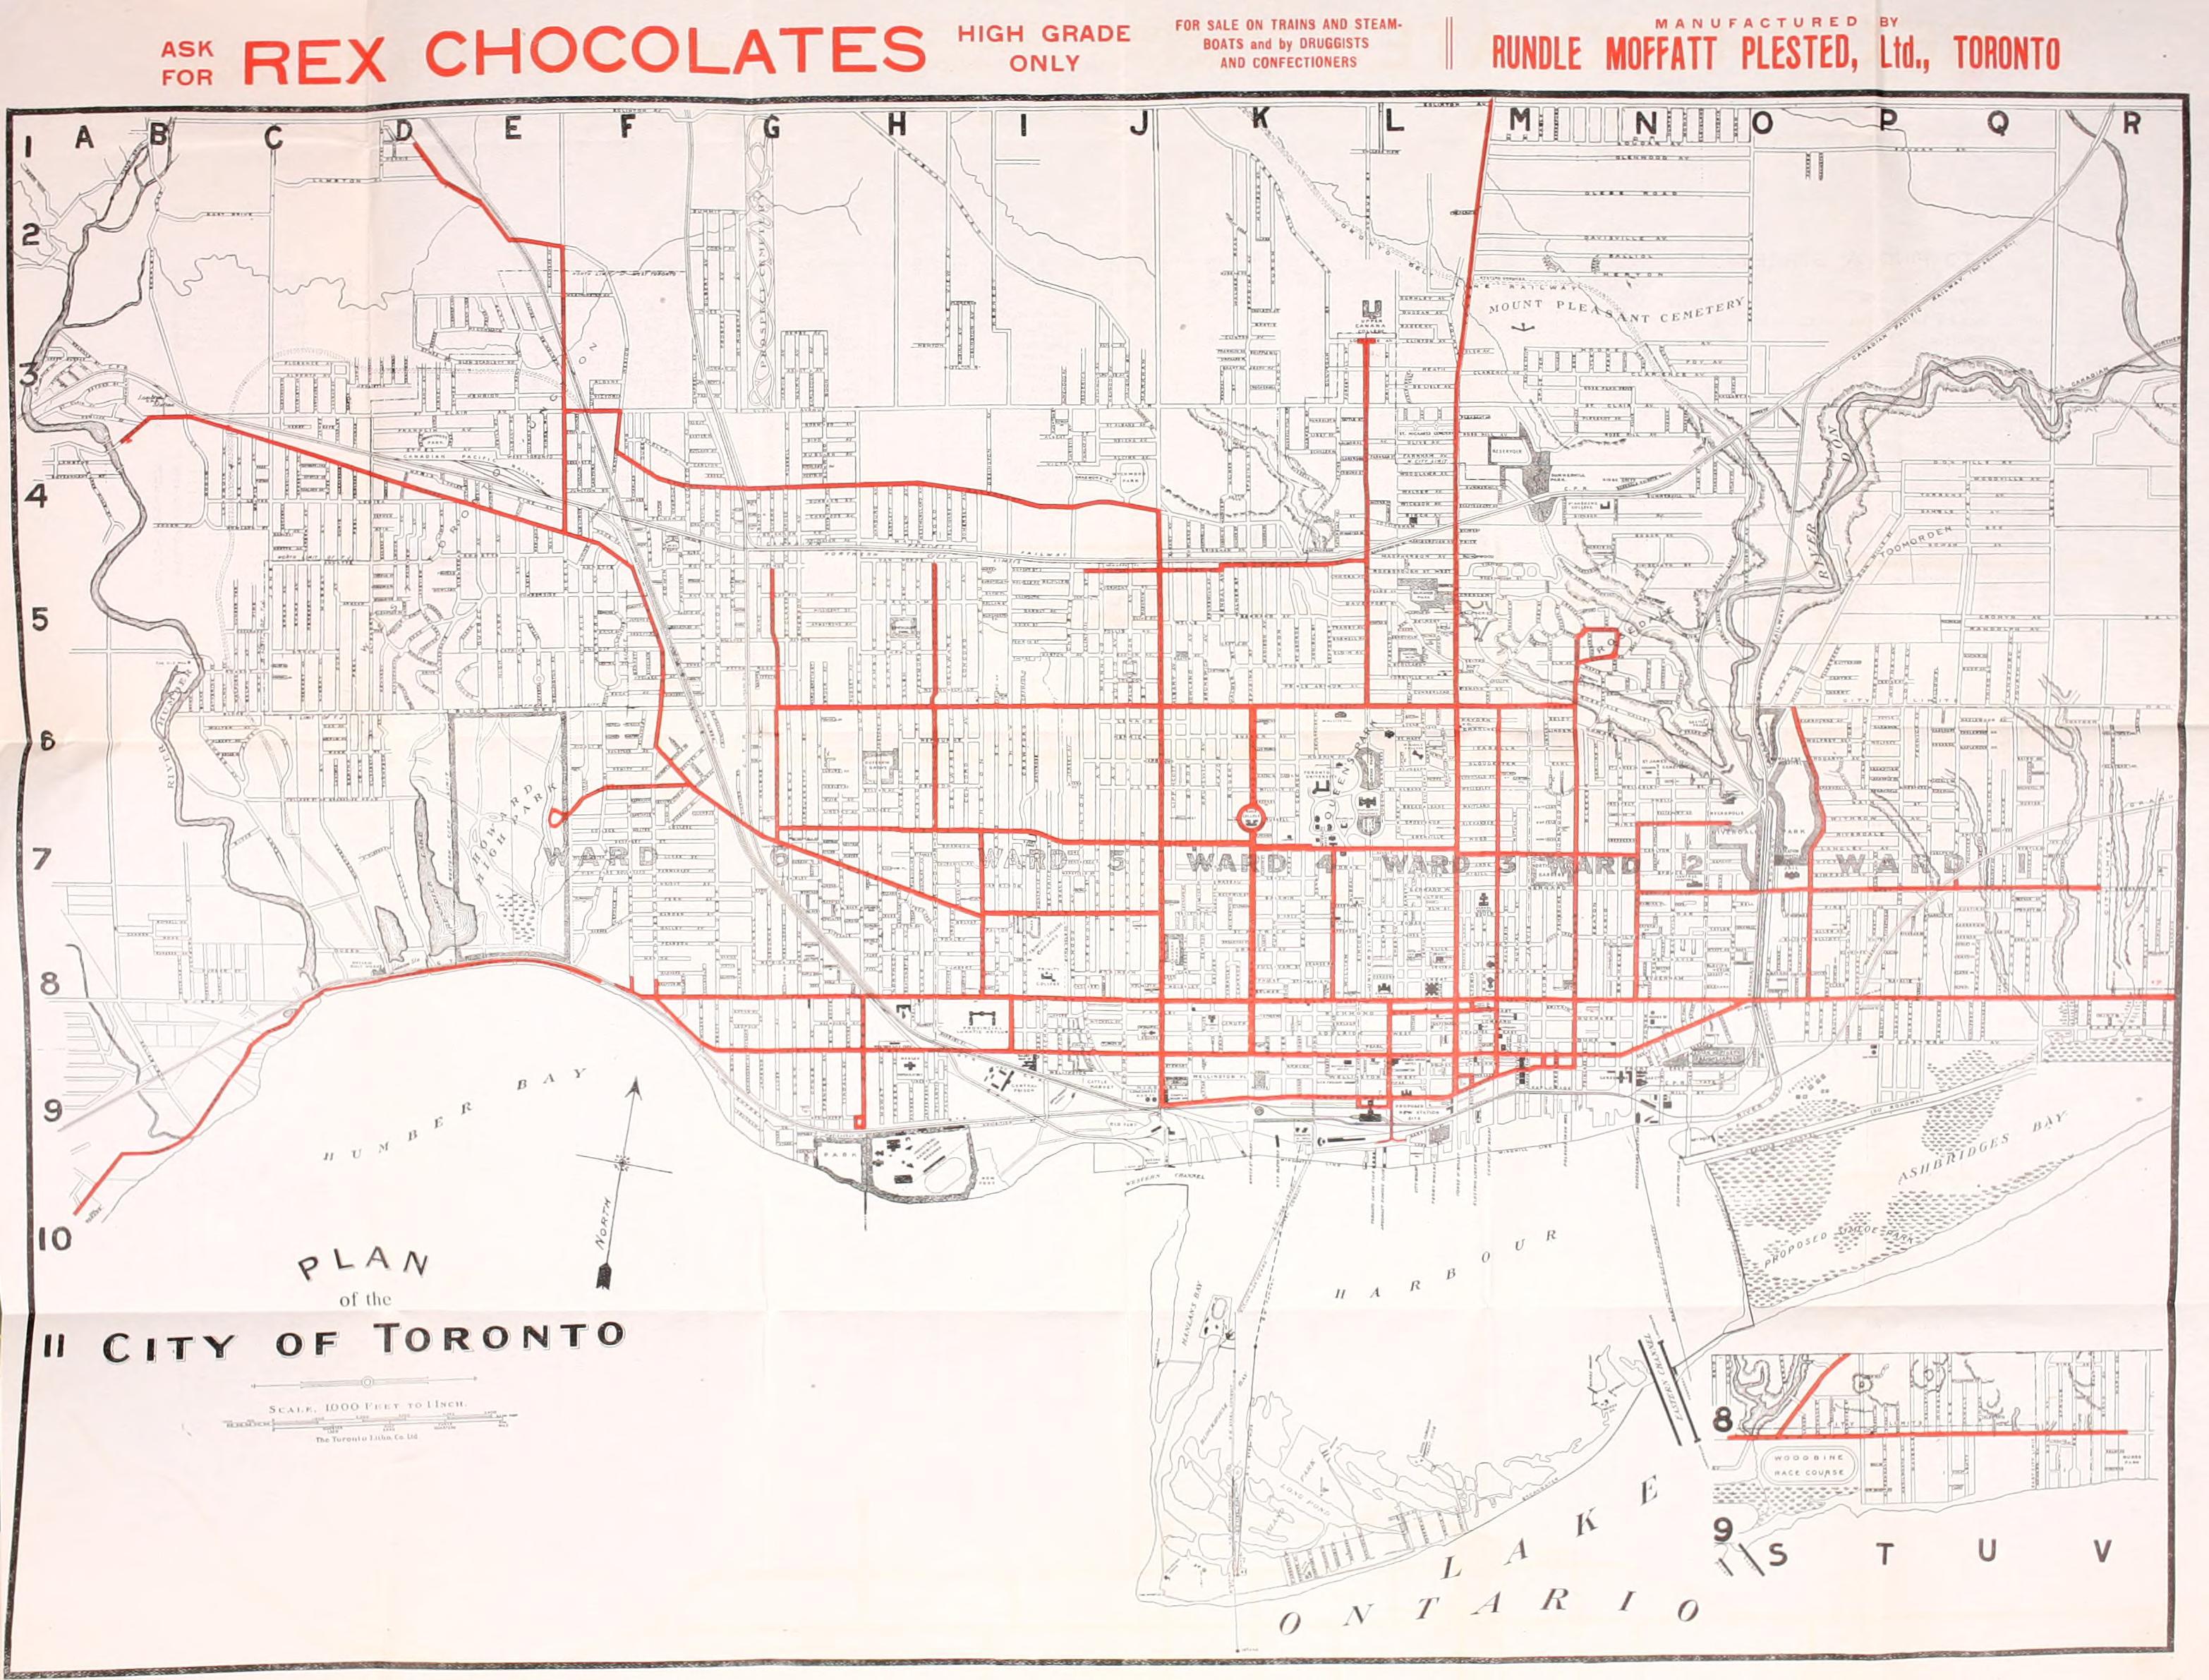 Toronto Streetcar Map File:Toronto streetcar map  1912.   Wikipedia